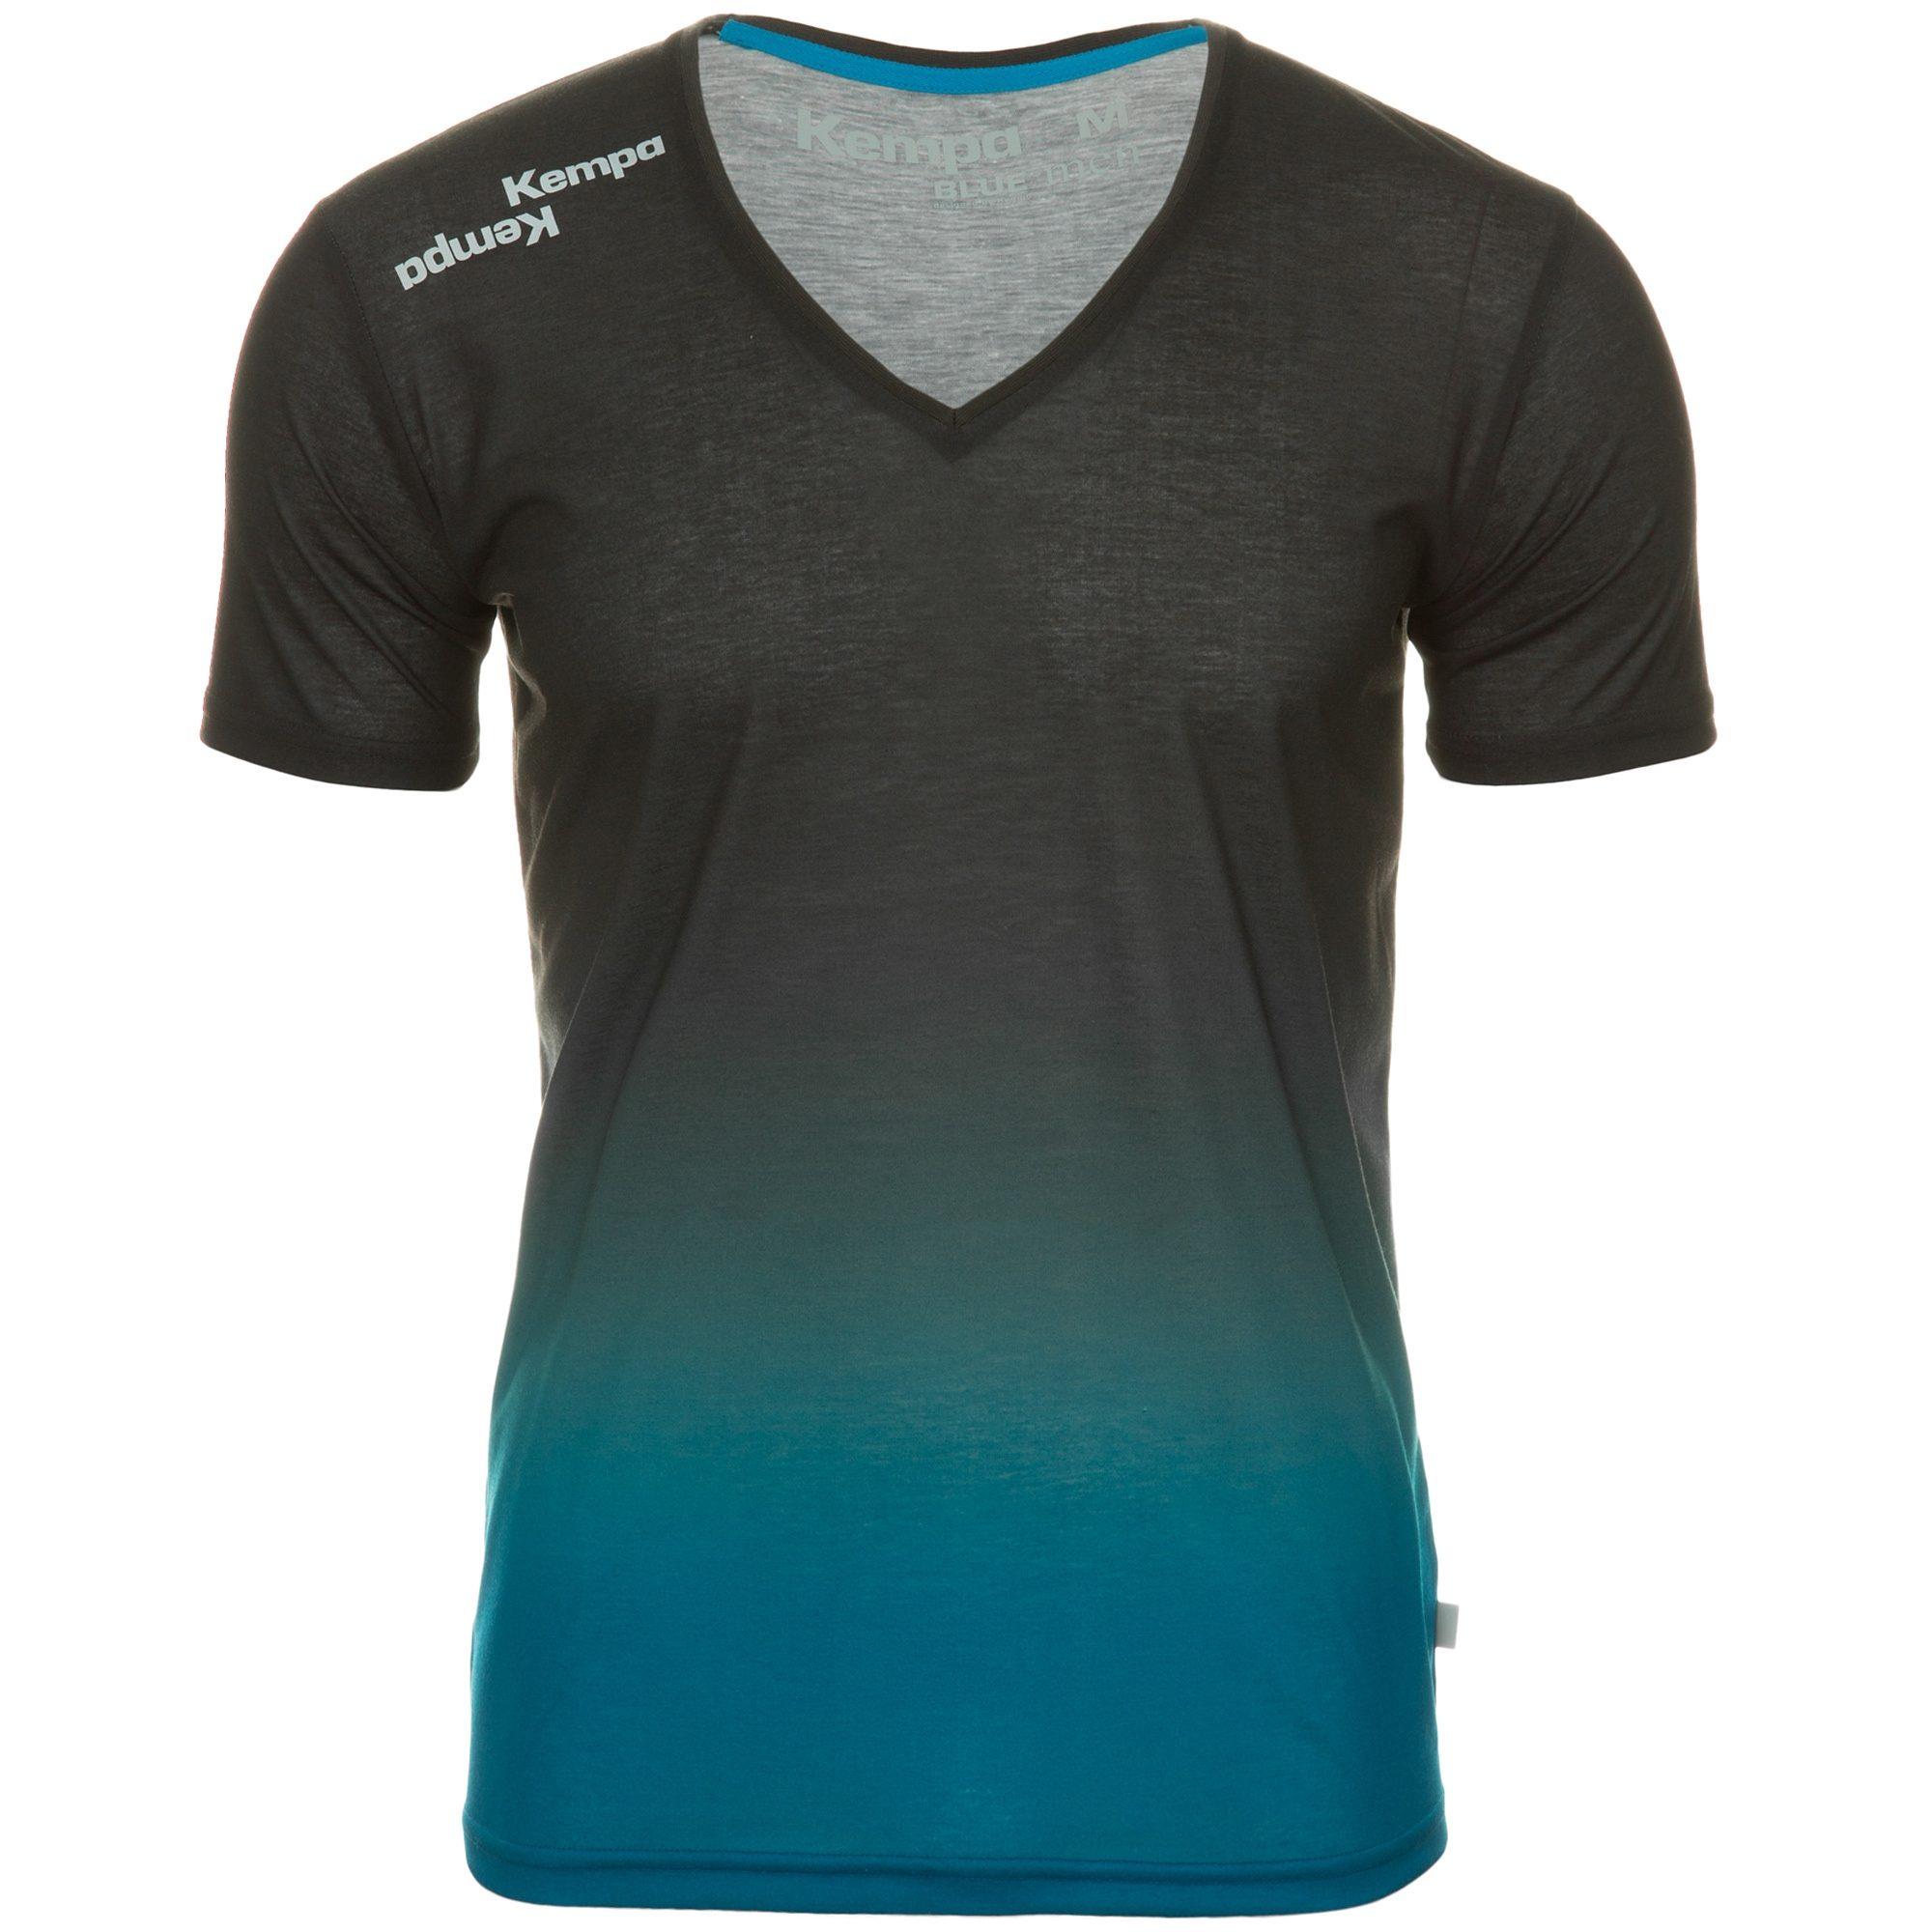 KEMPA Blue T-Shirt Kinder